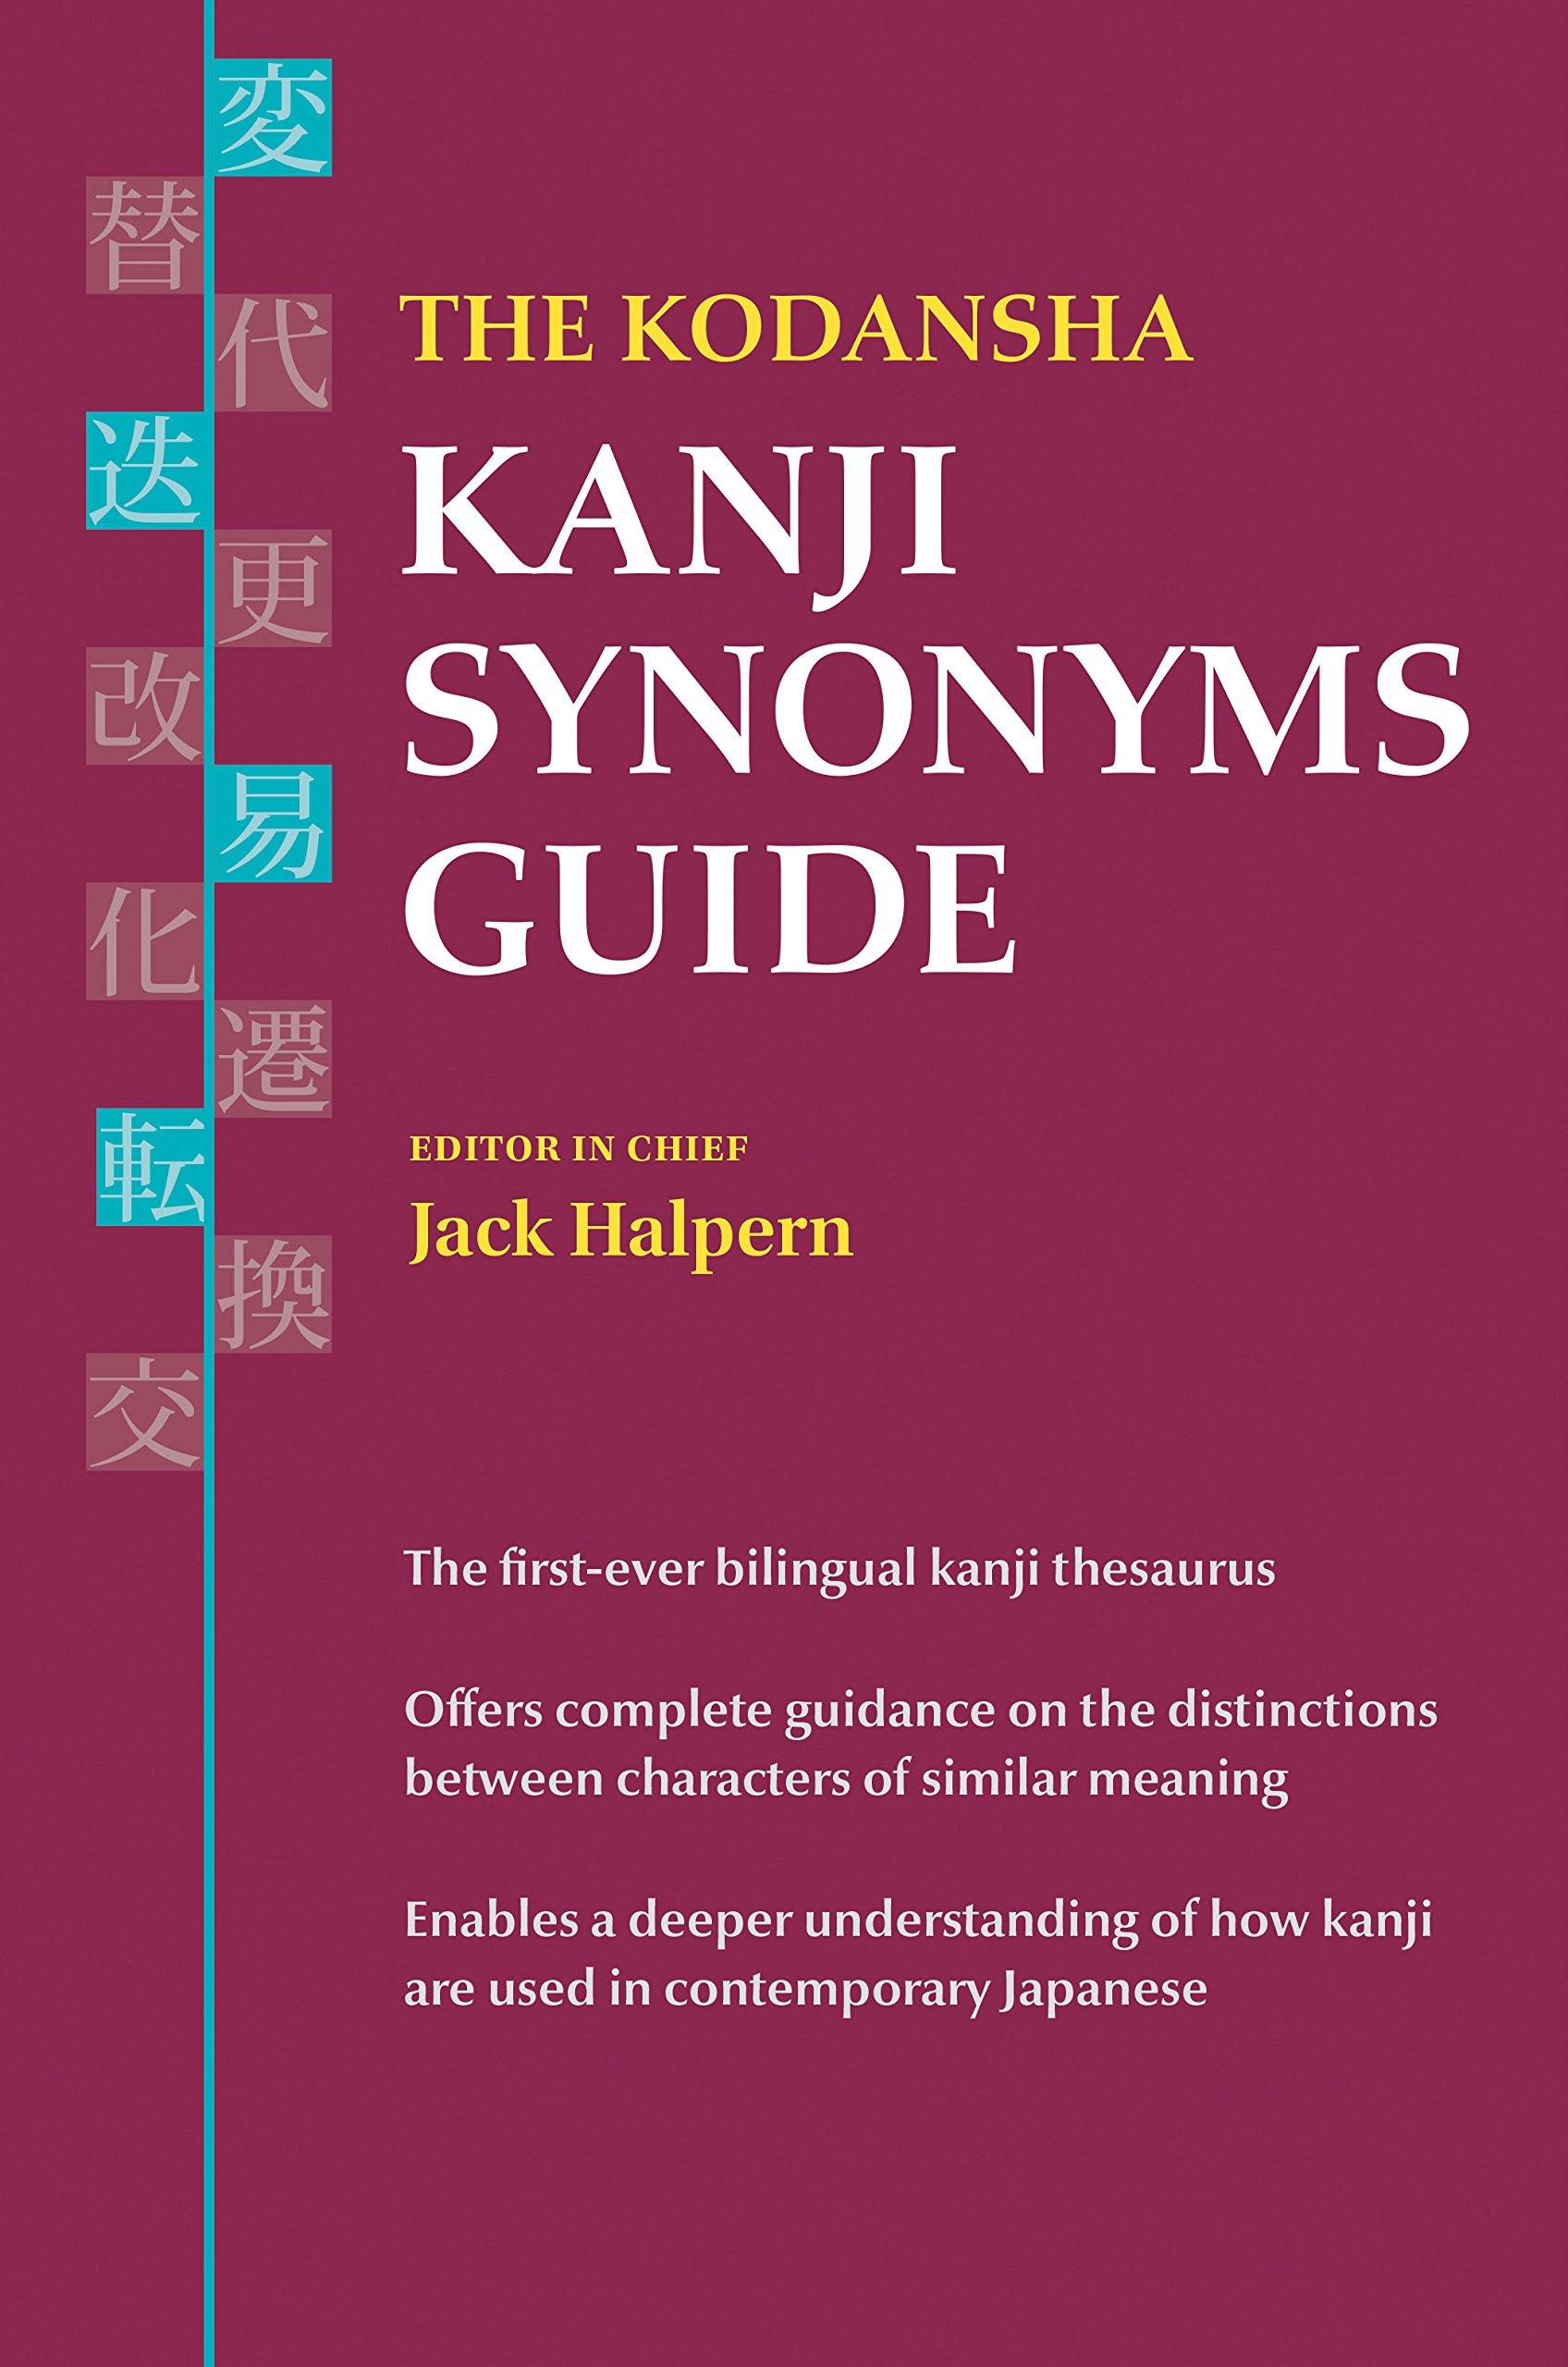 The Kodansha Kanji Synonyms Guide: Jack Halpern: 9781568365855 ...